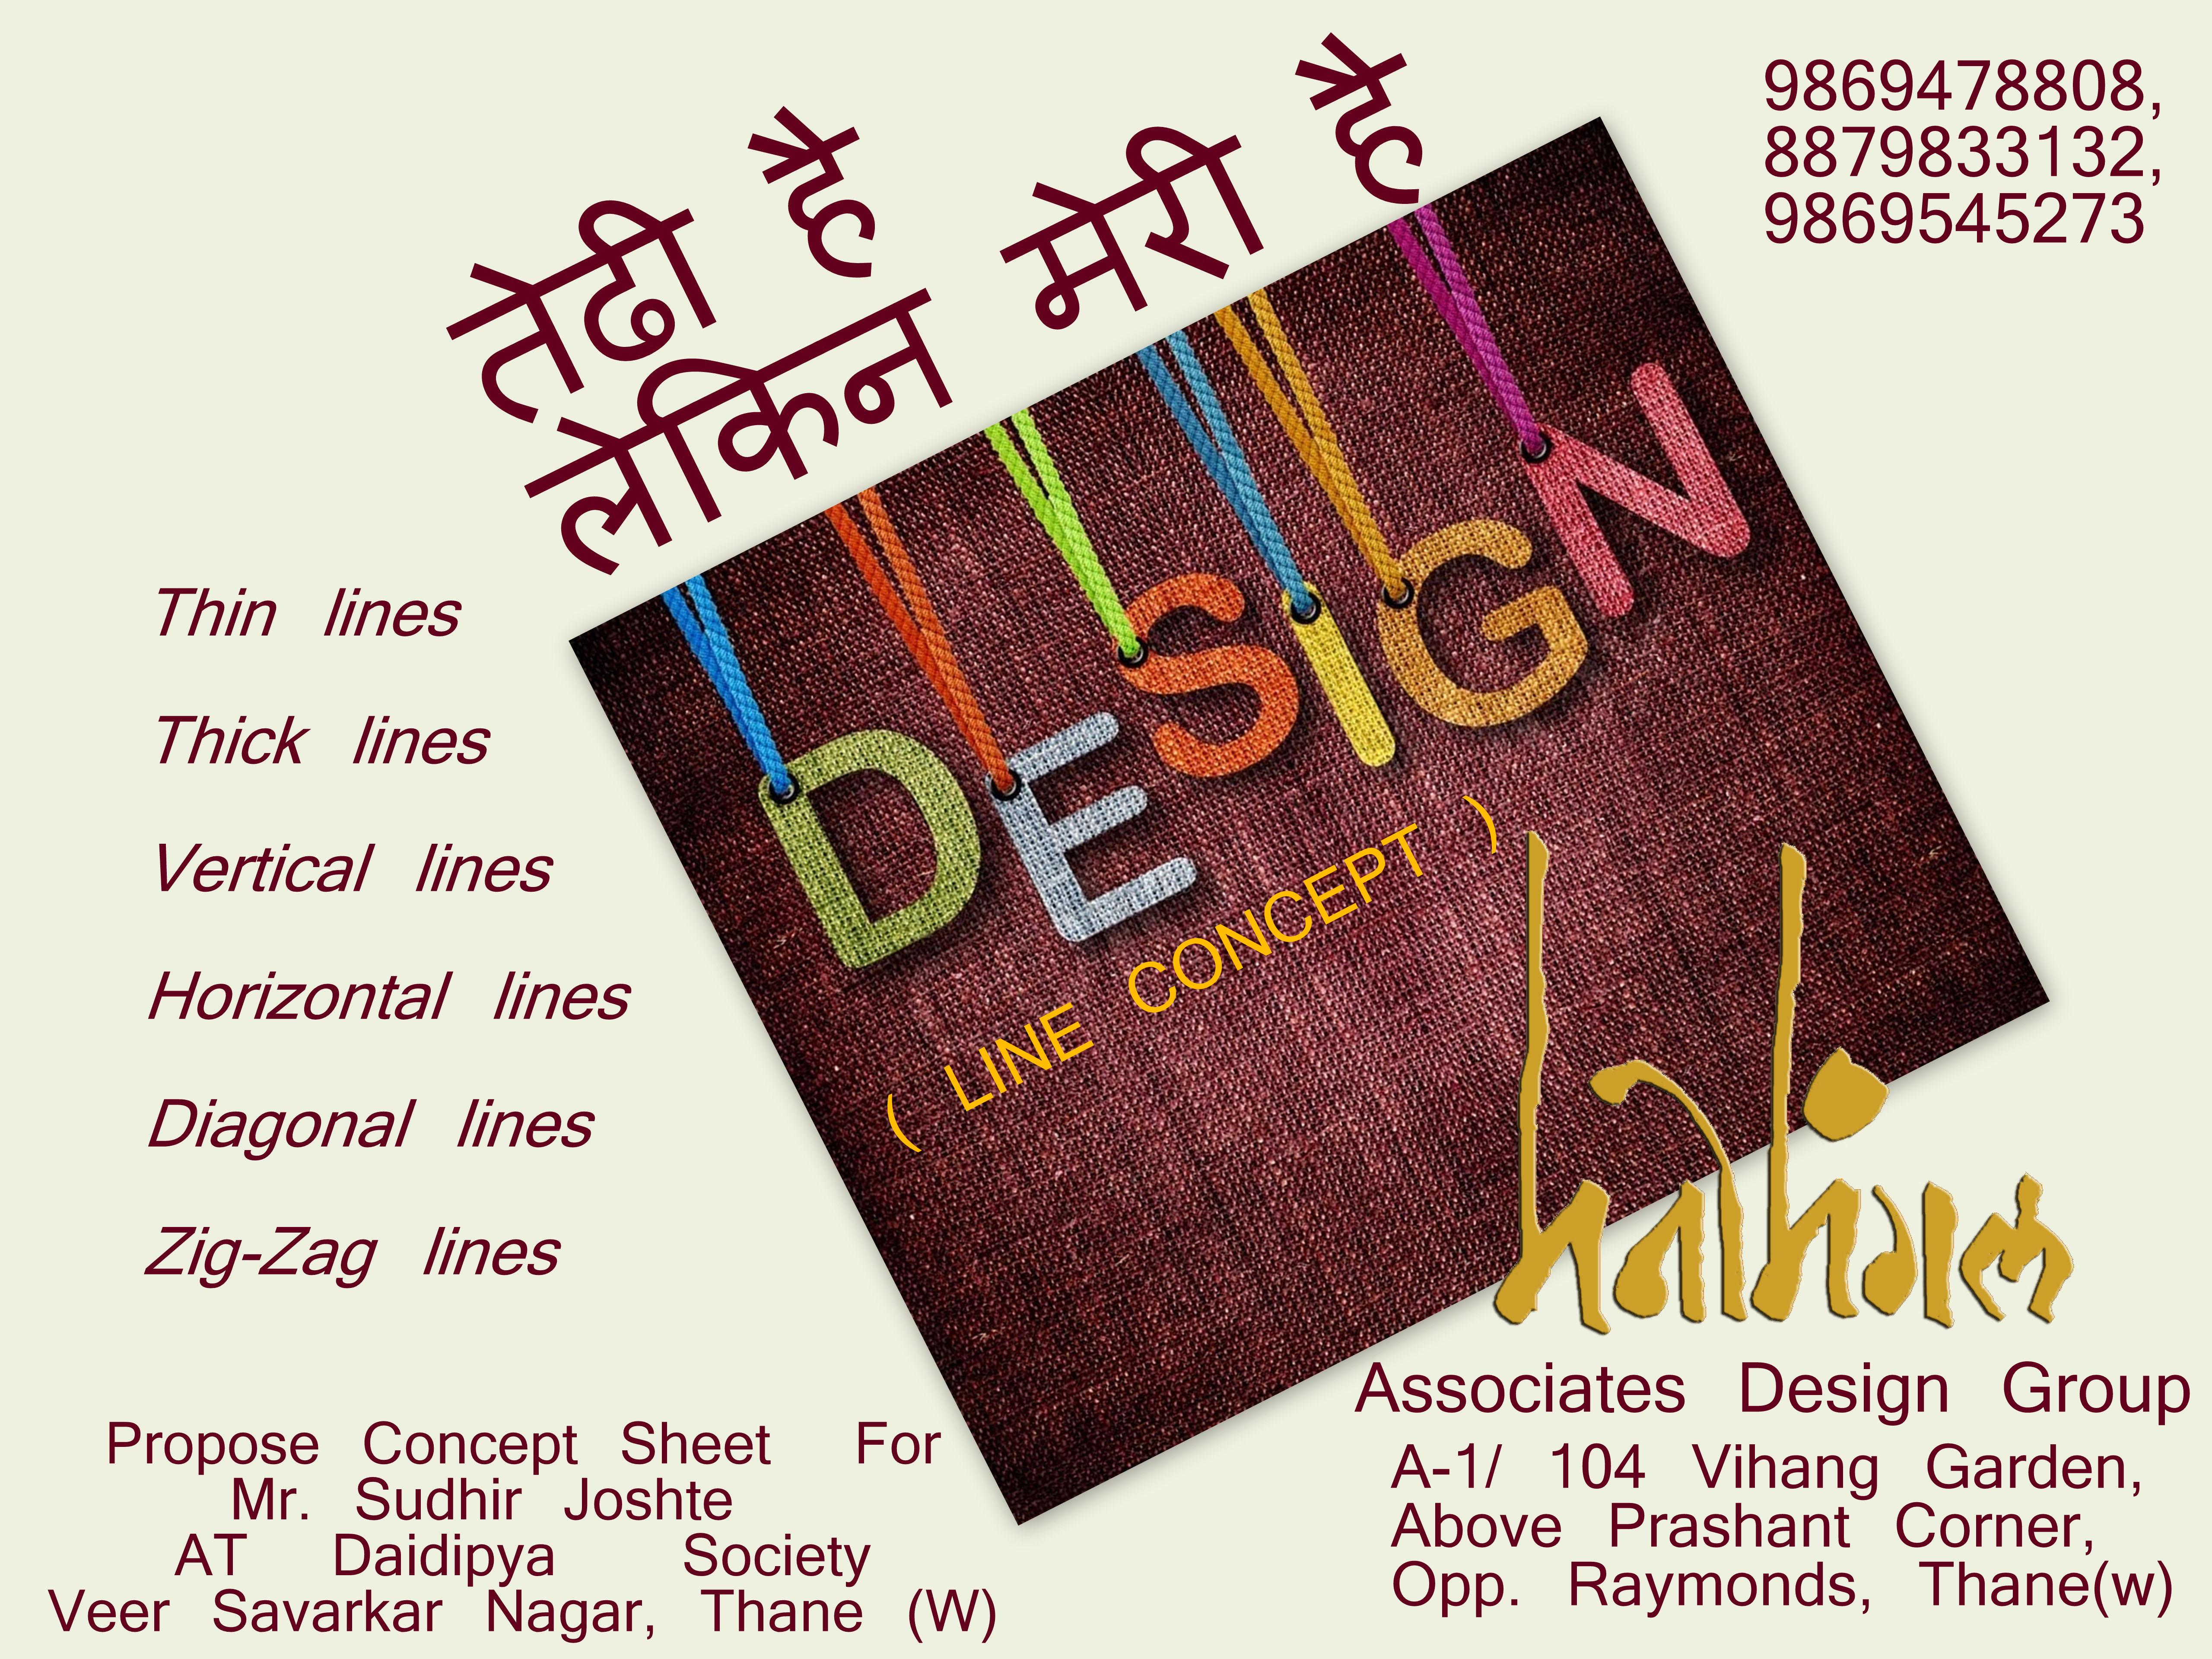 Line Concept for Mr. Sudhir Joshte Site.